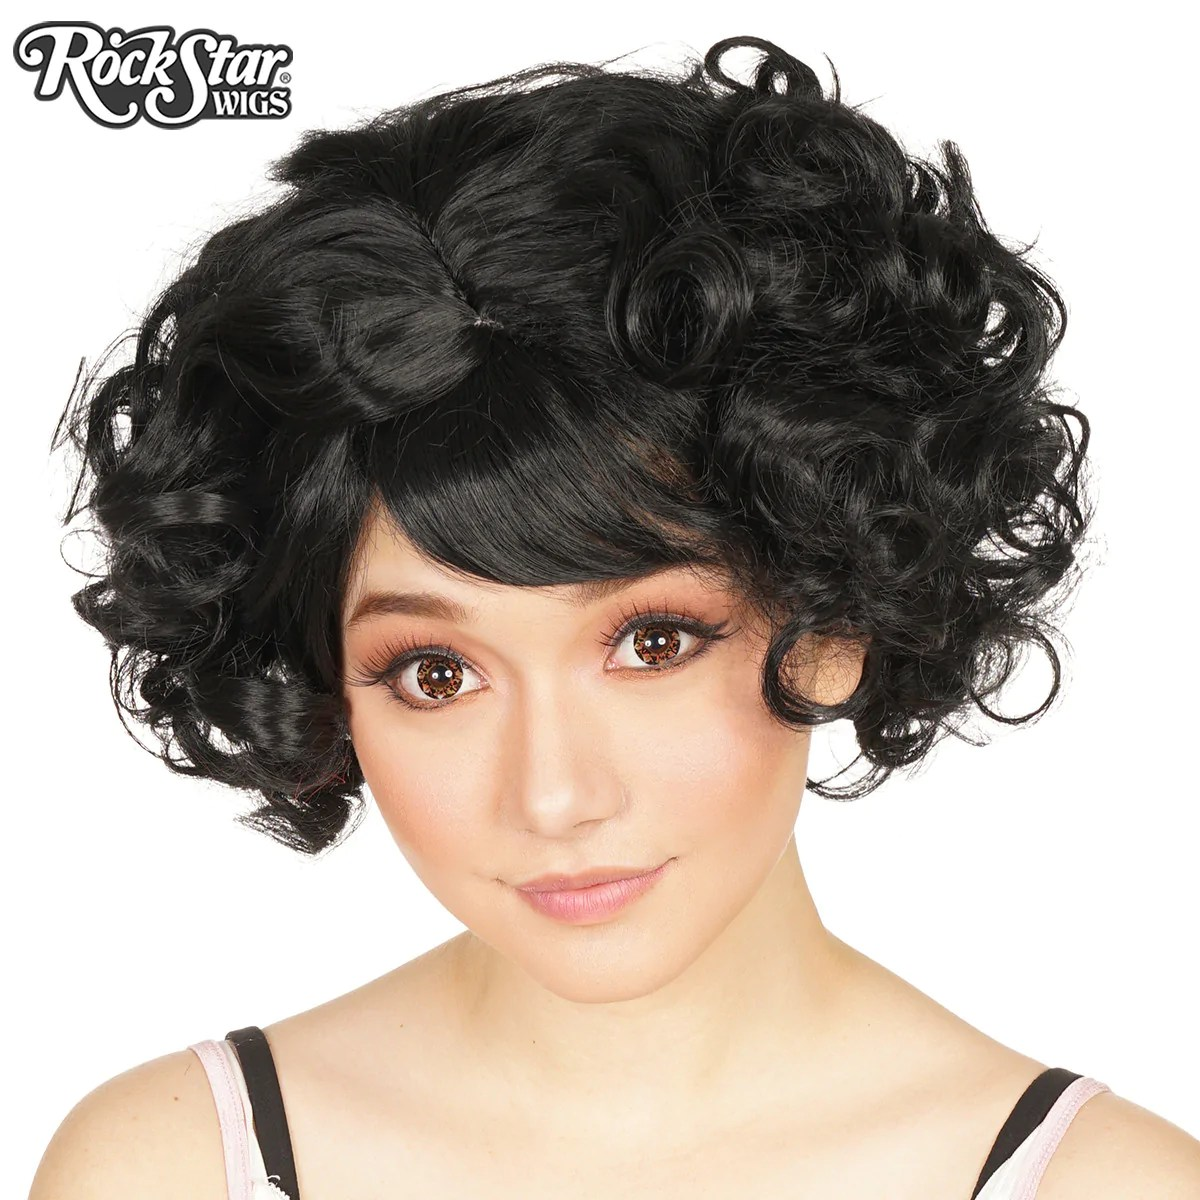 Gothic Lolita Wigs Curly Bob Black Mix Dolluxe